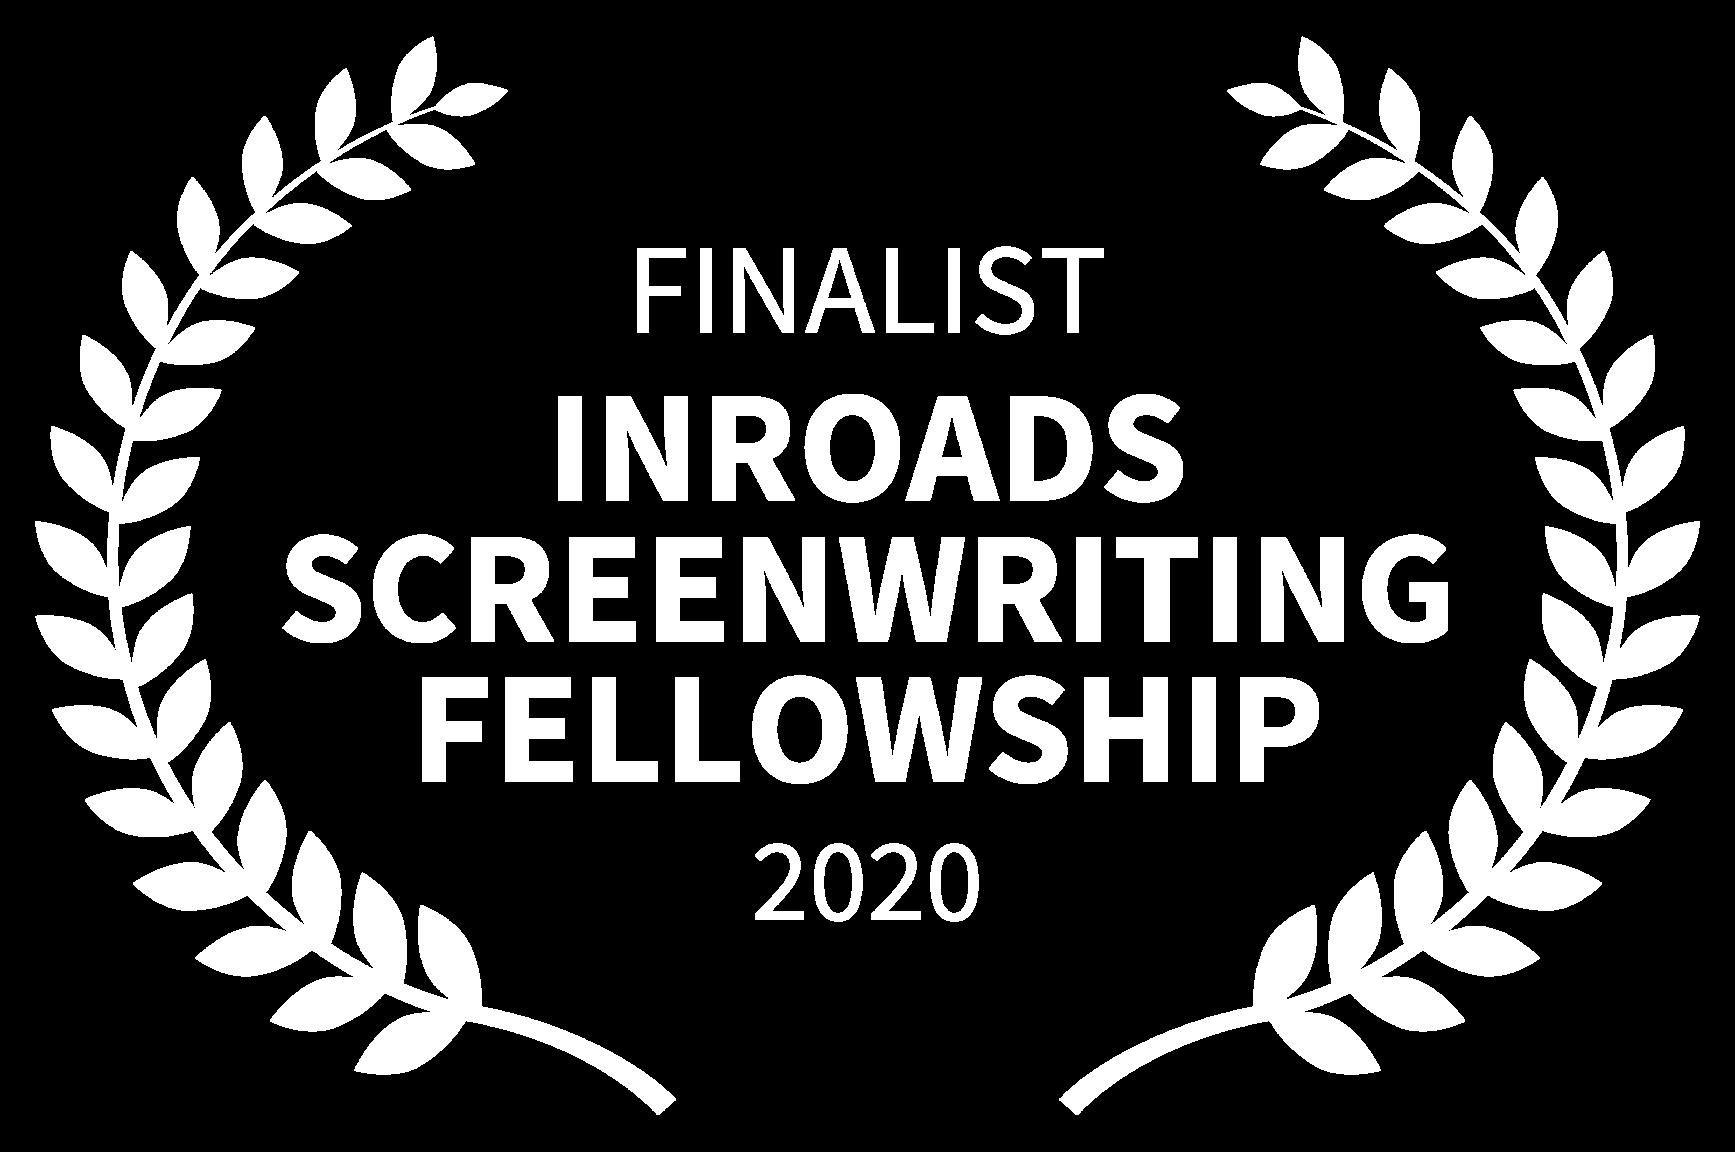 FINALIST - INROADS SCREENWRITING FELLOWSHIP - 2020